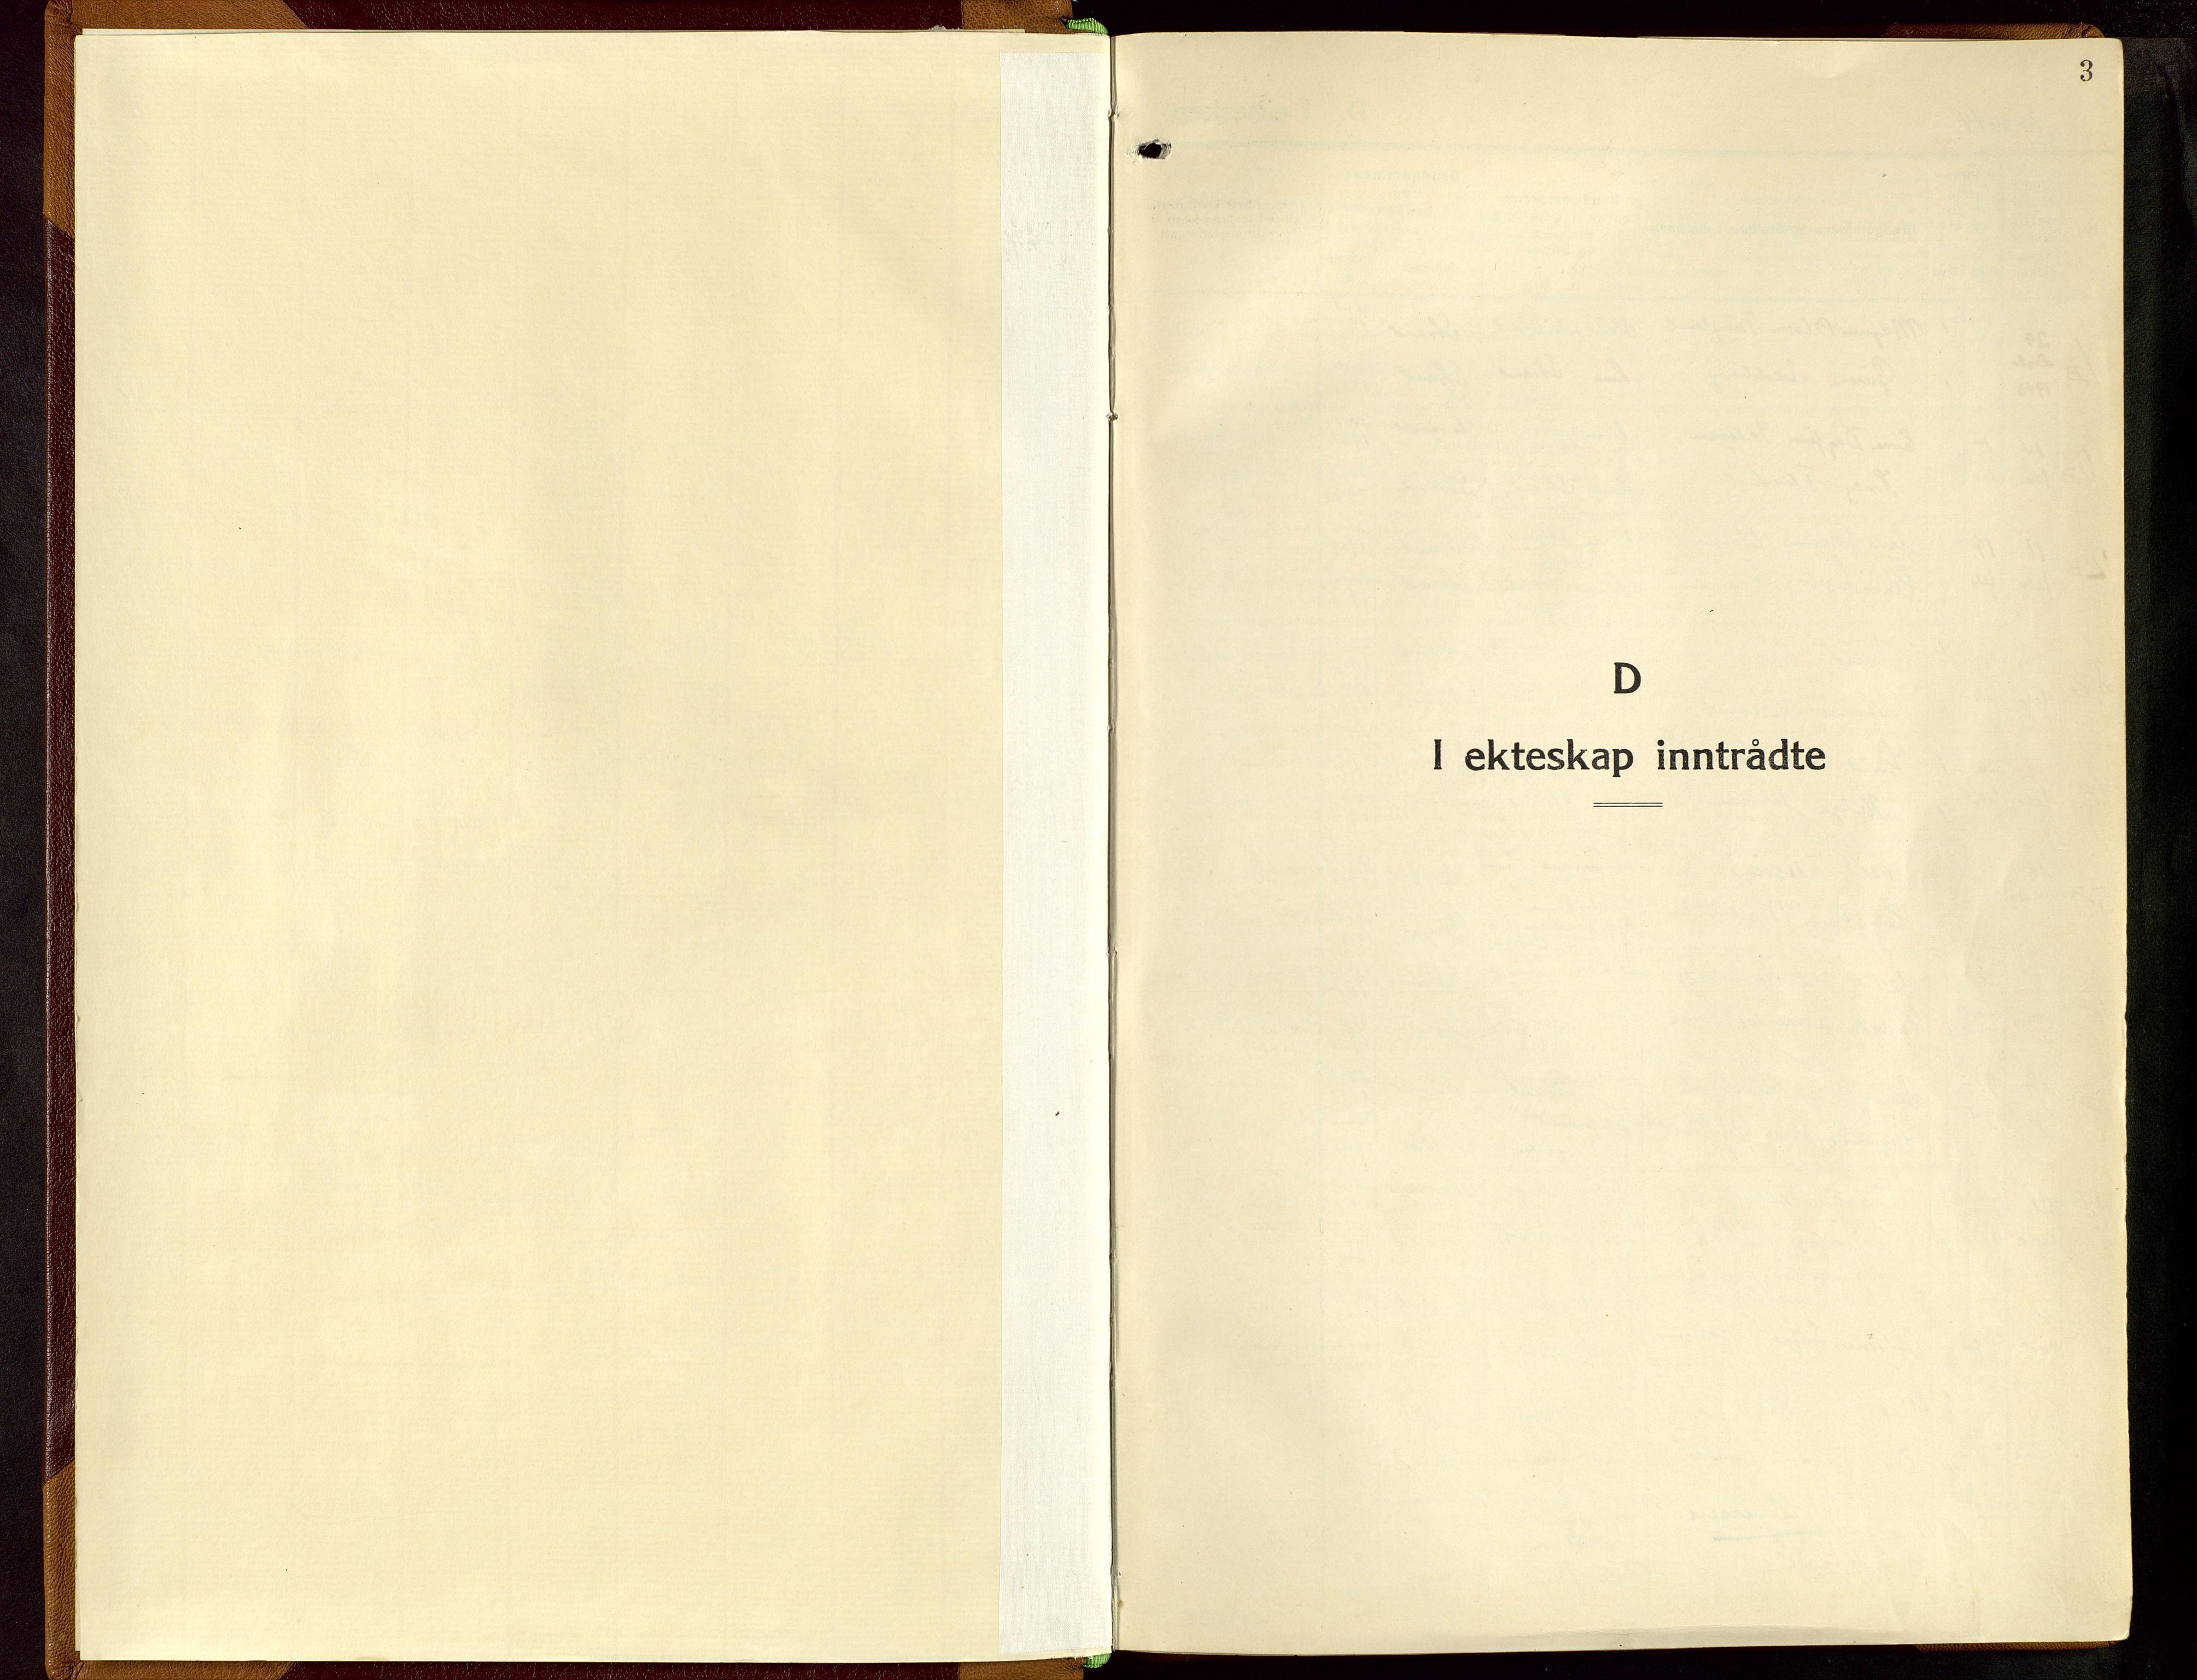 SAST, Strand sokneprestkontor, H/Ha/Haa/L0014: Ministerialbok nr. A 14, 1944-1968, s. 3